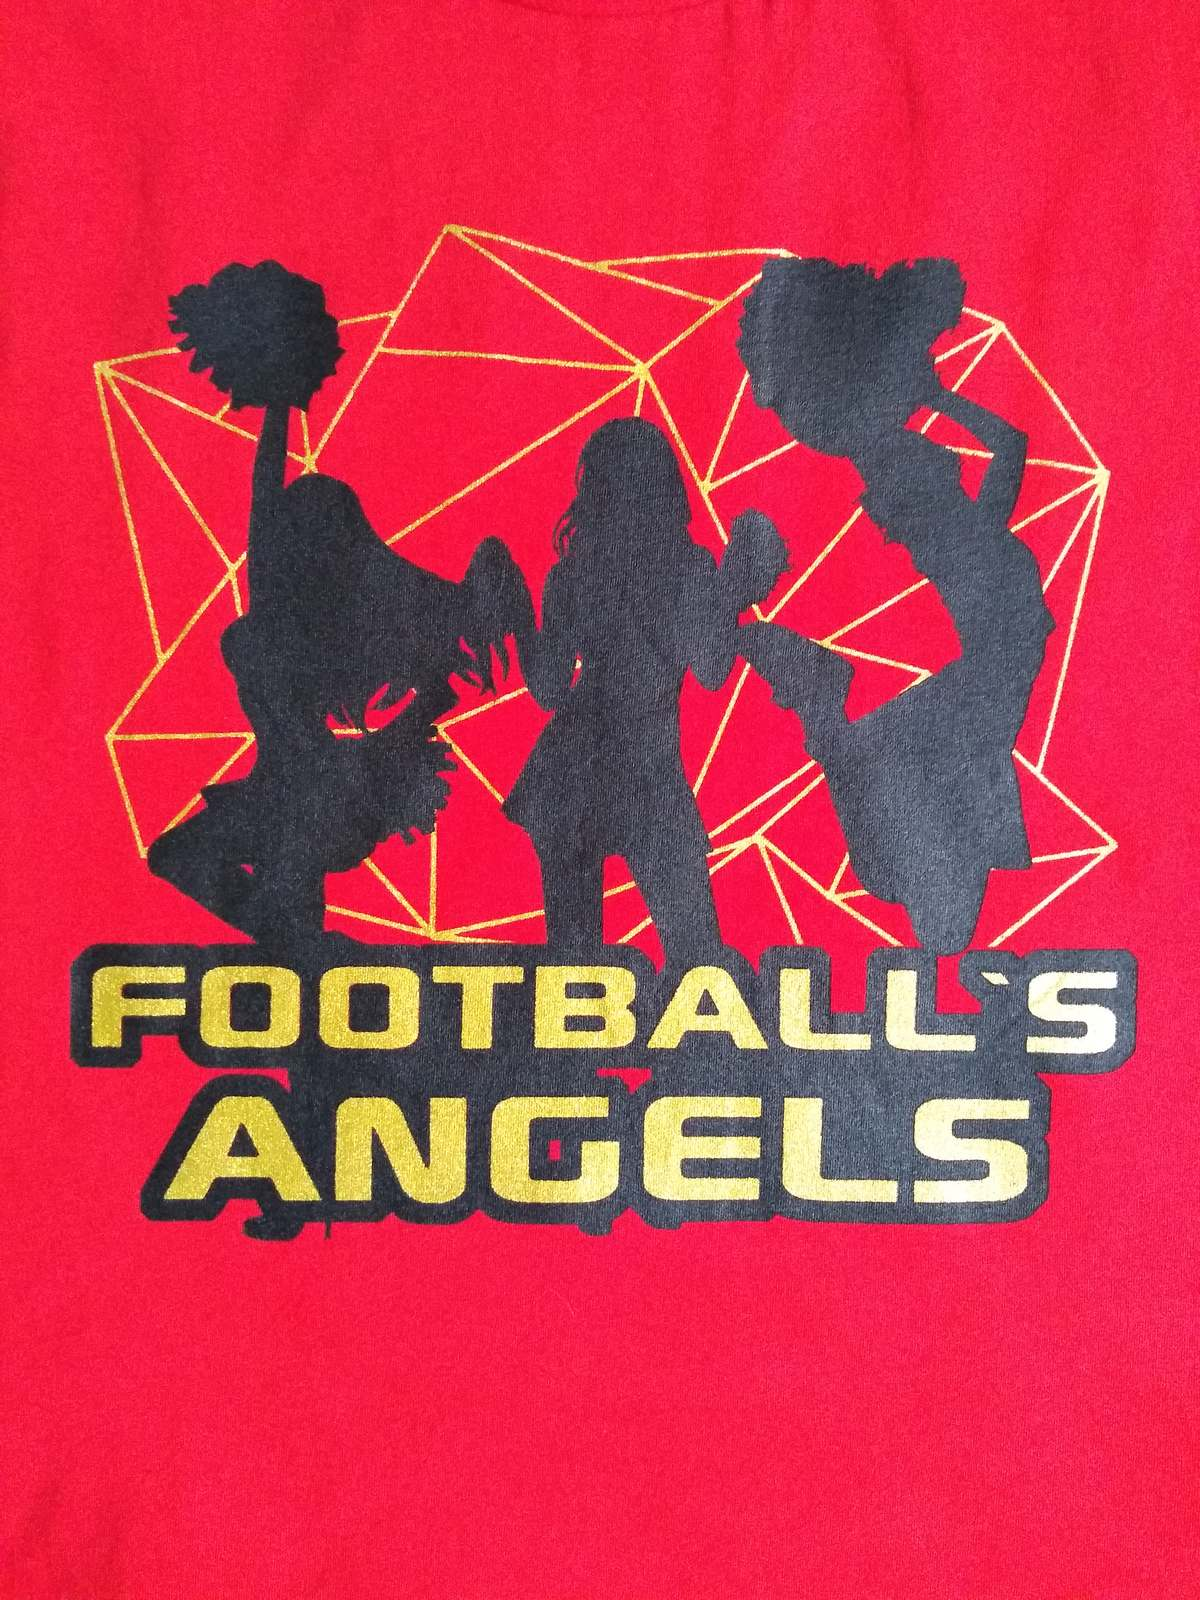 CAMISETA FOOTBALL ANGEL'S RED FEM